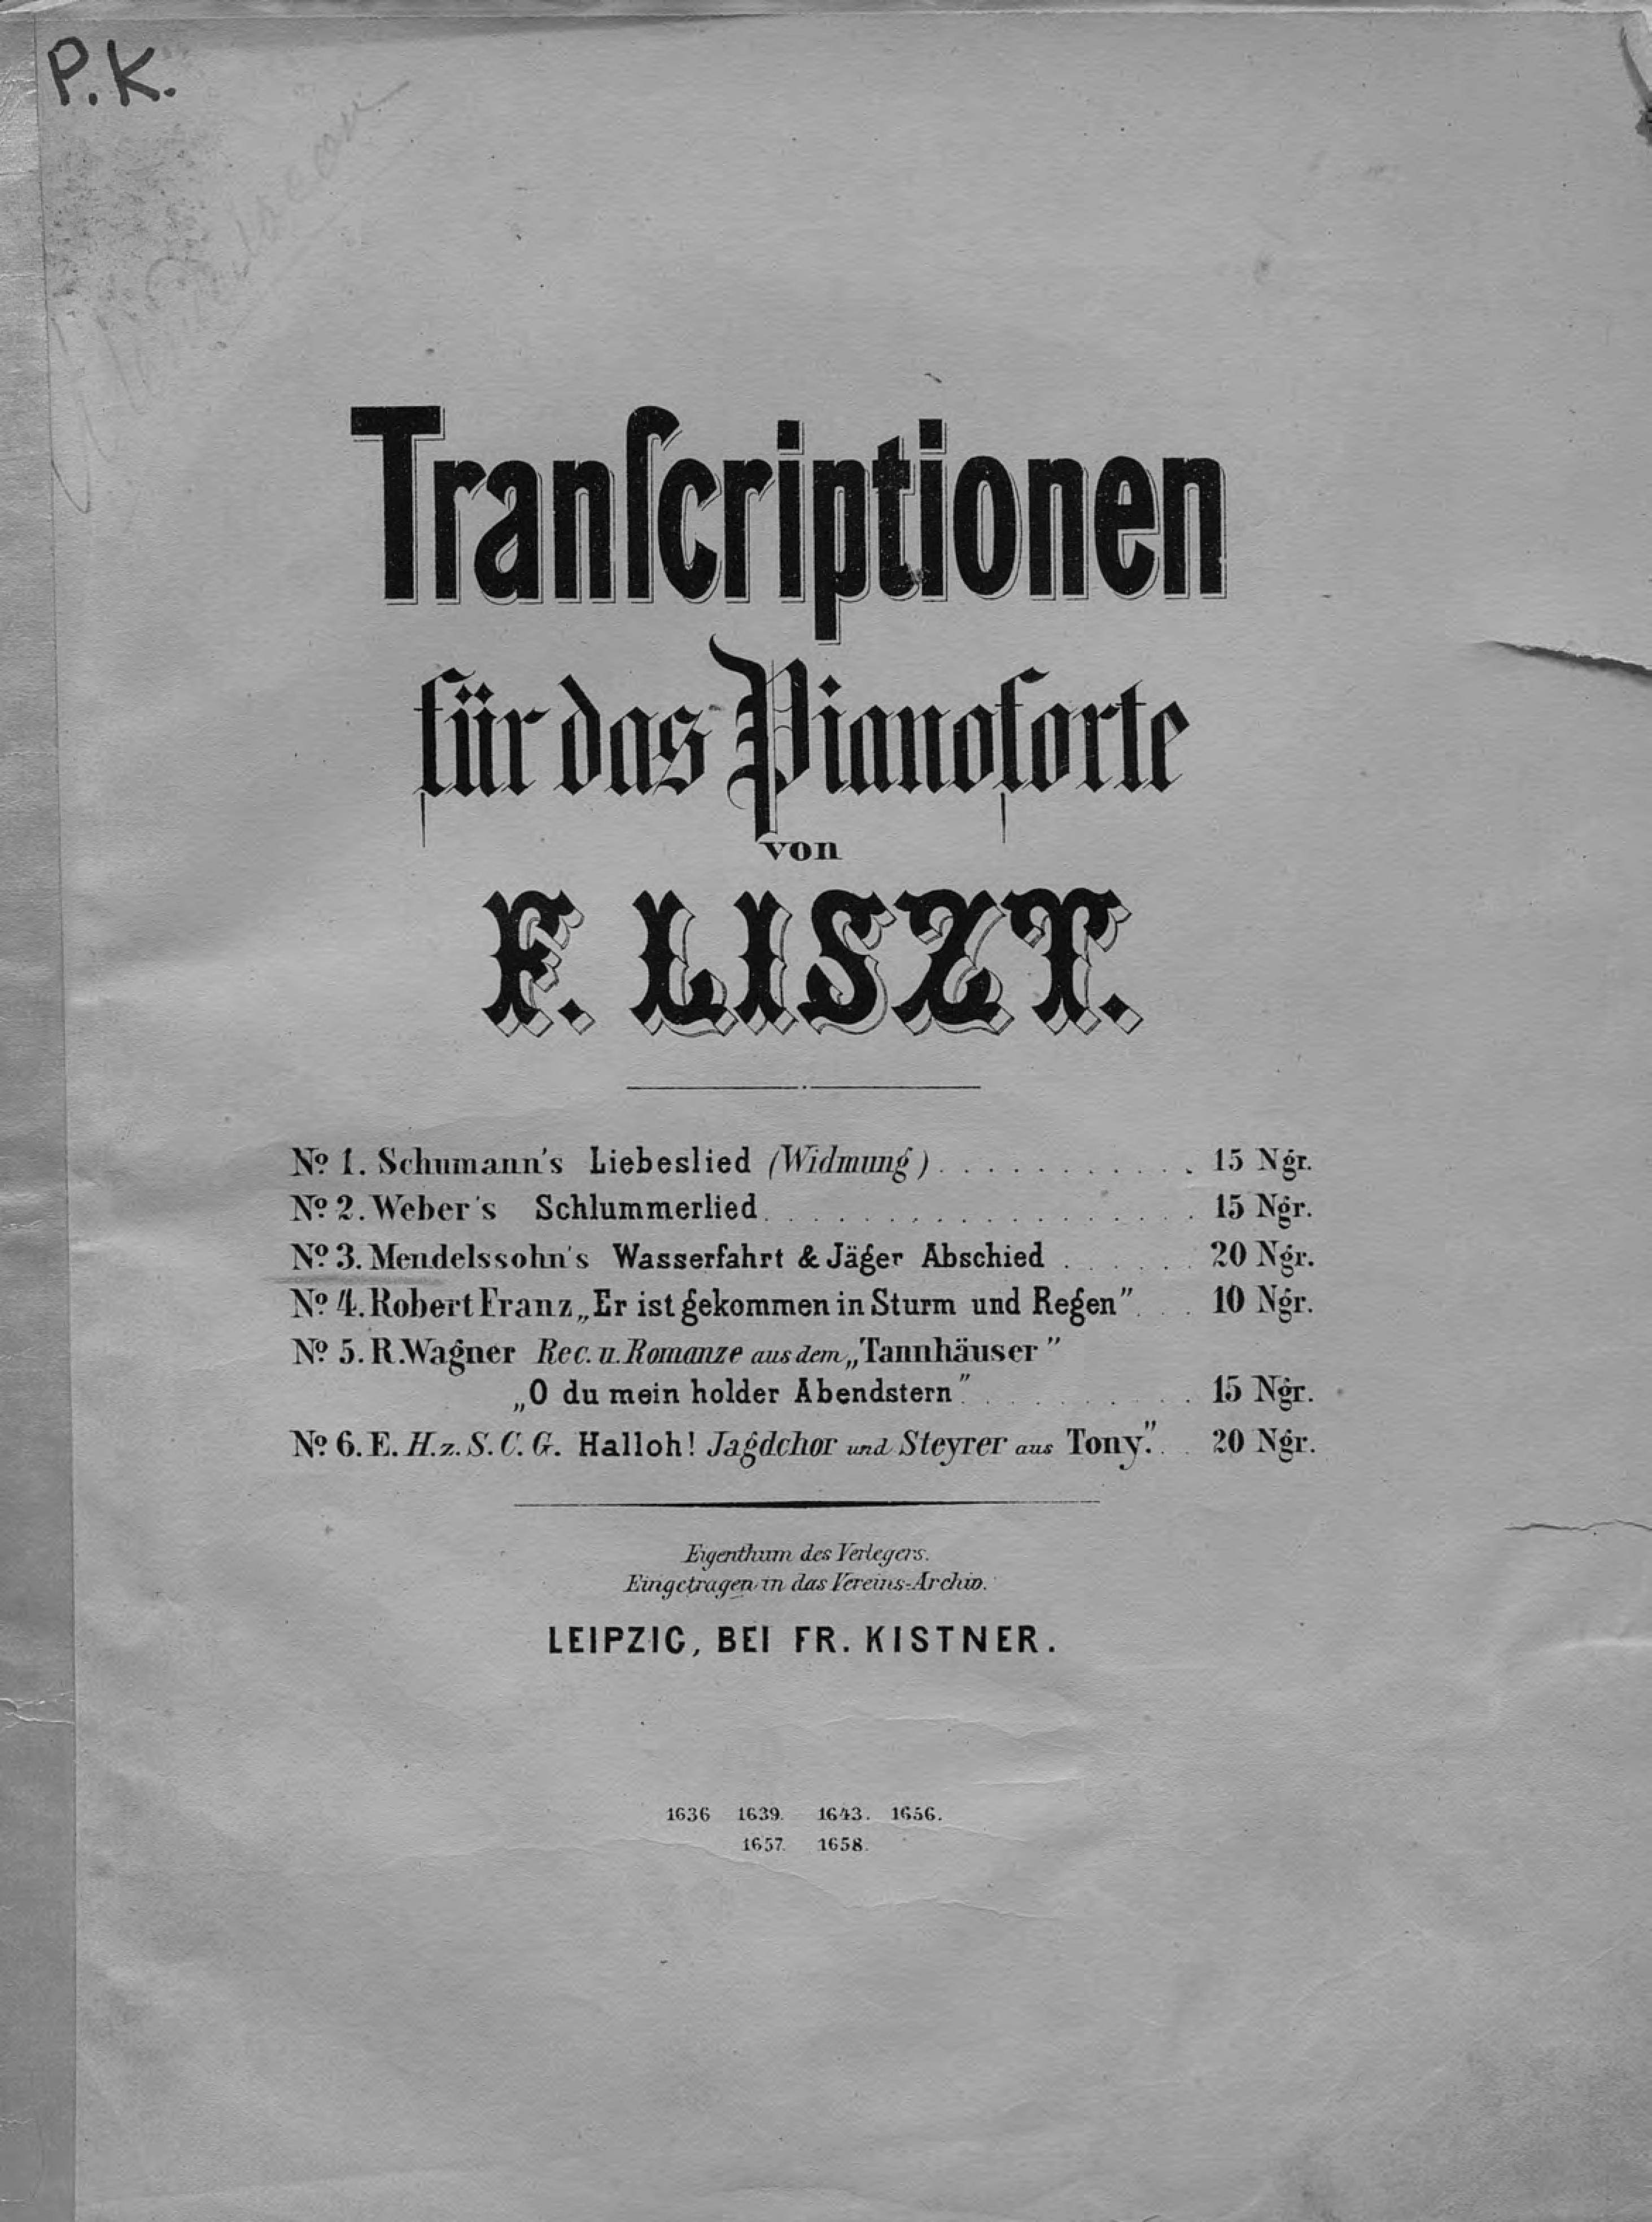 Ференц Лист Mendelssohn's Wasserfahrt & Jager Abschied fur das Pianoforte ubertragen v. F. Liszt цена 2017